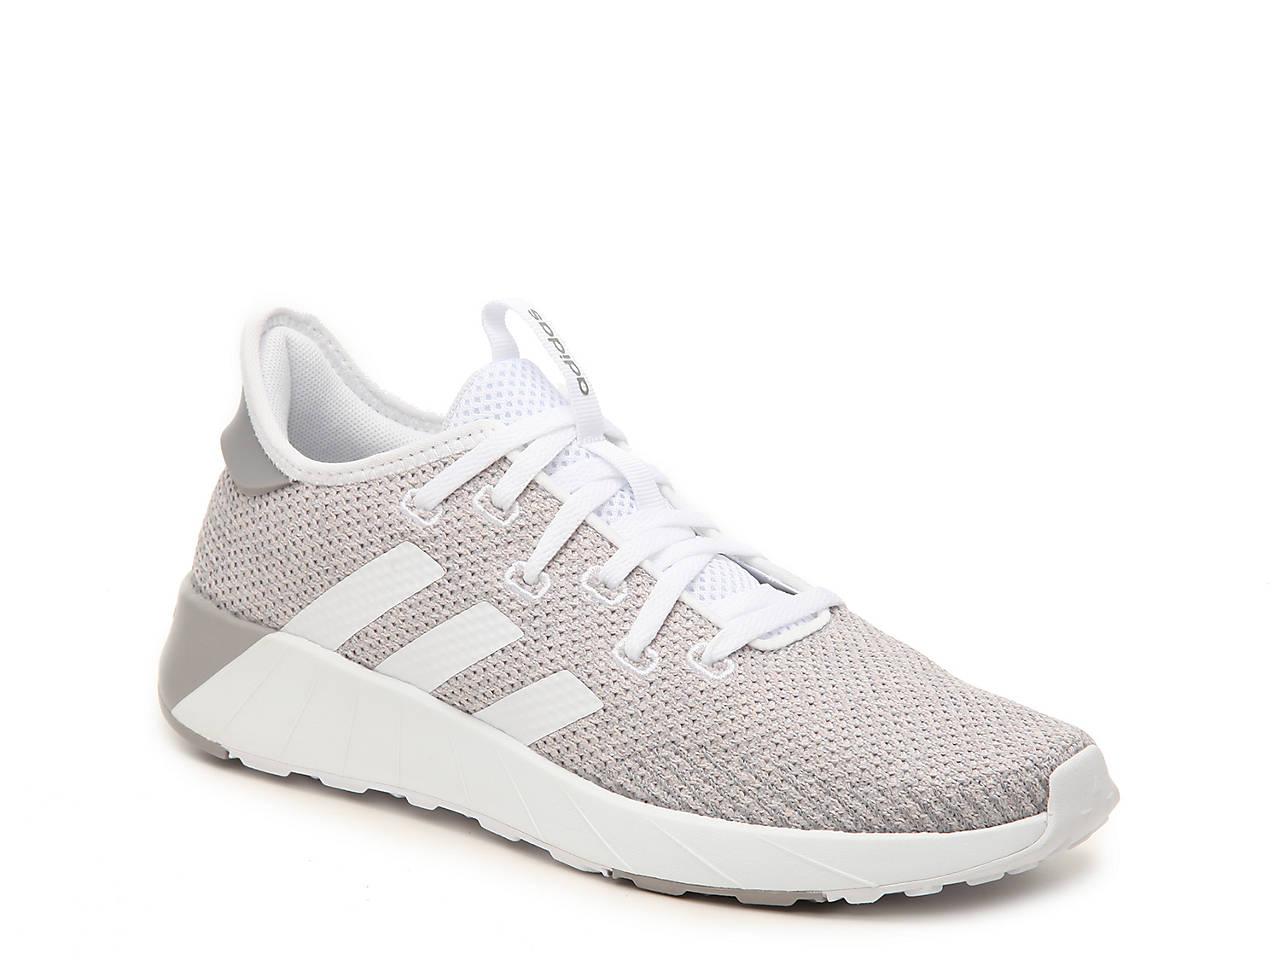 e8b584fd4d425 adidas Questar X BYD Sneaker - Women s Women s Shoes